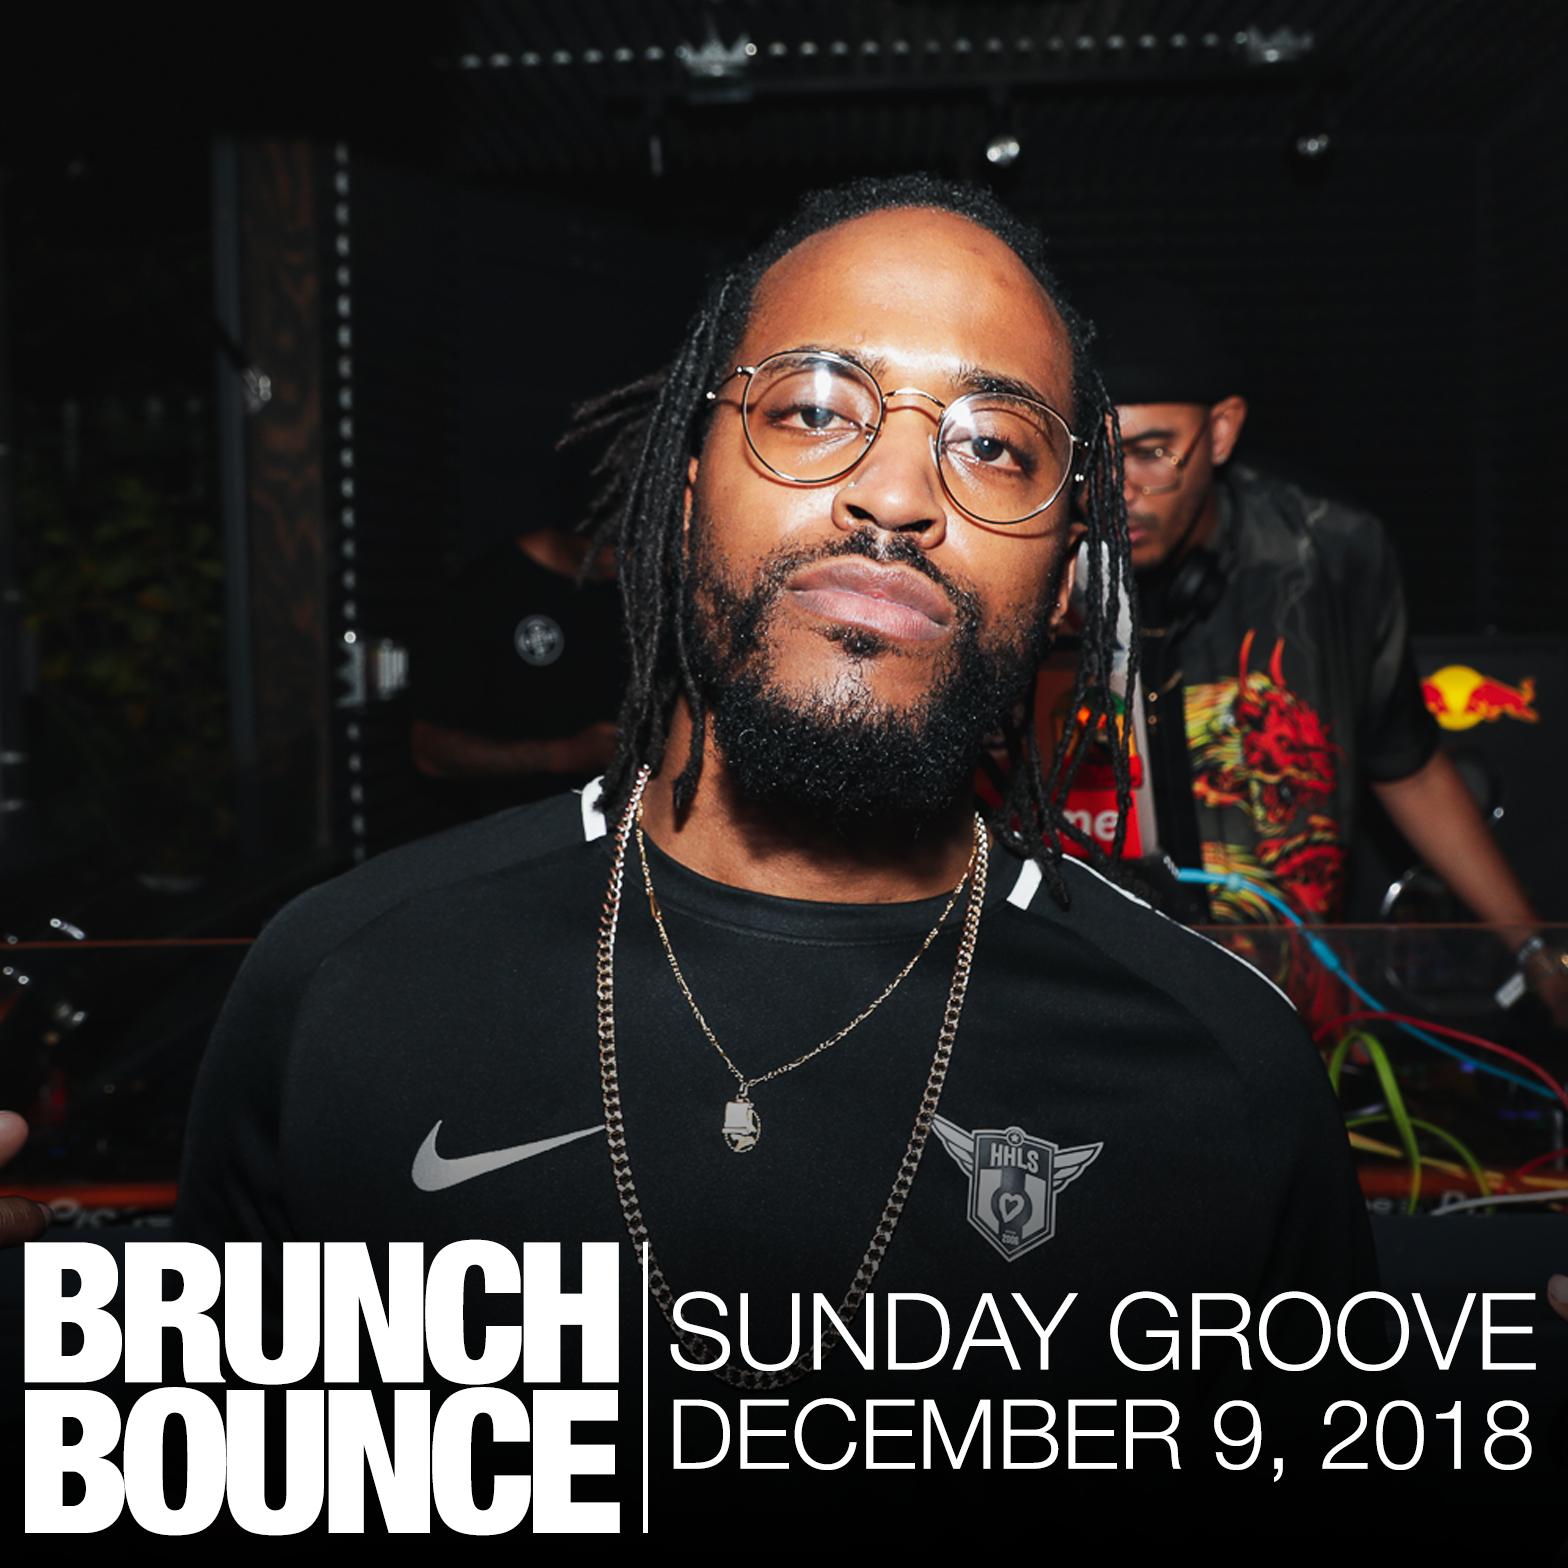 Sunday Groove 12.9.18